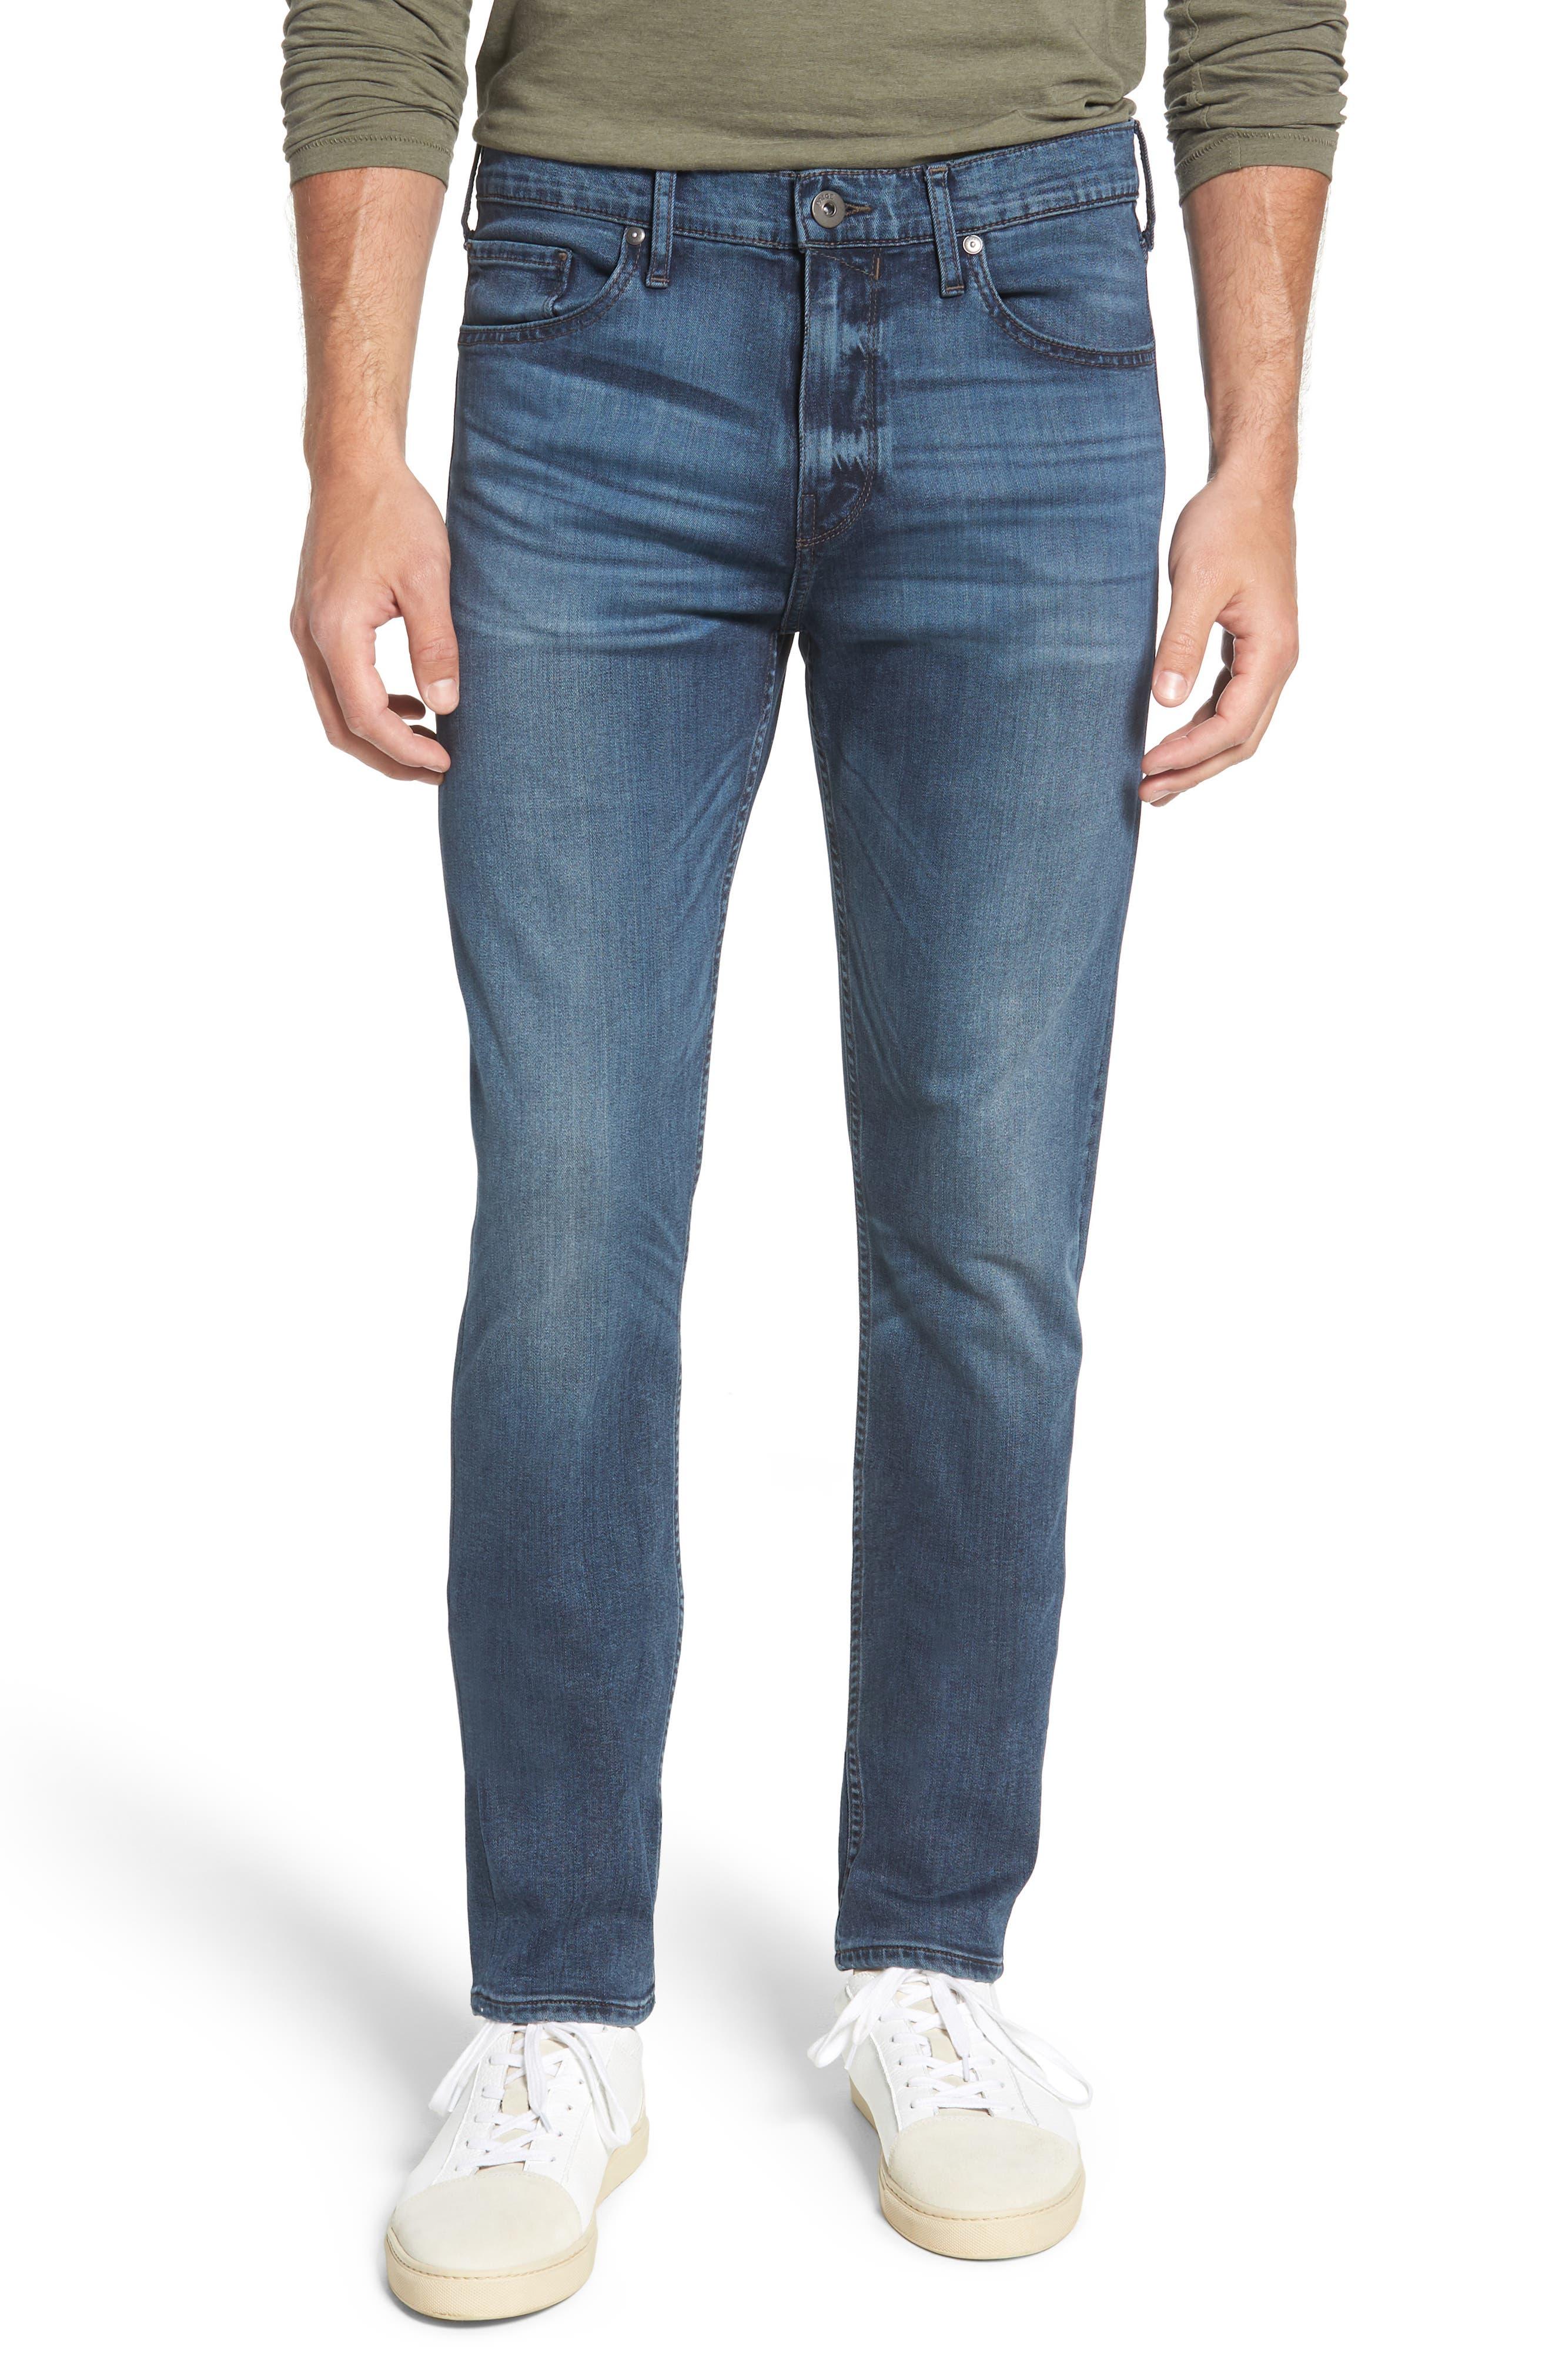 Transcend - Lennox Slim Fit Jeans,                             Main thumbnail 1, color,                             GRAMMERCY